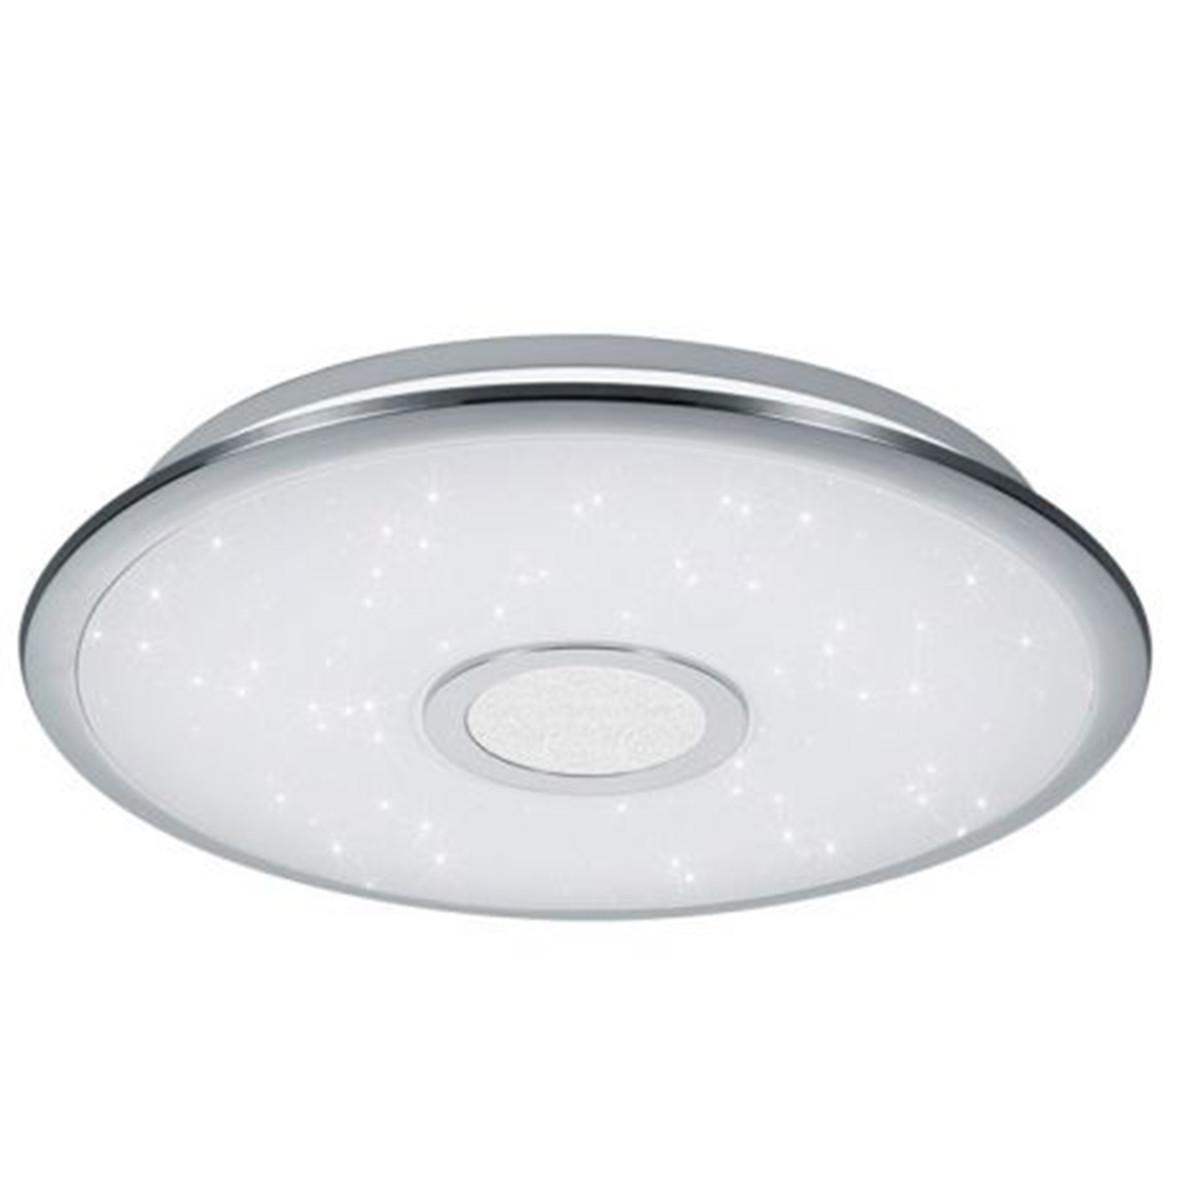 LED Plafondlamp - Trion Osirina - 30W - Aanpasbare Kleur - Dimbaar - Afstandsbediening - Rond - Glan